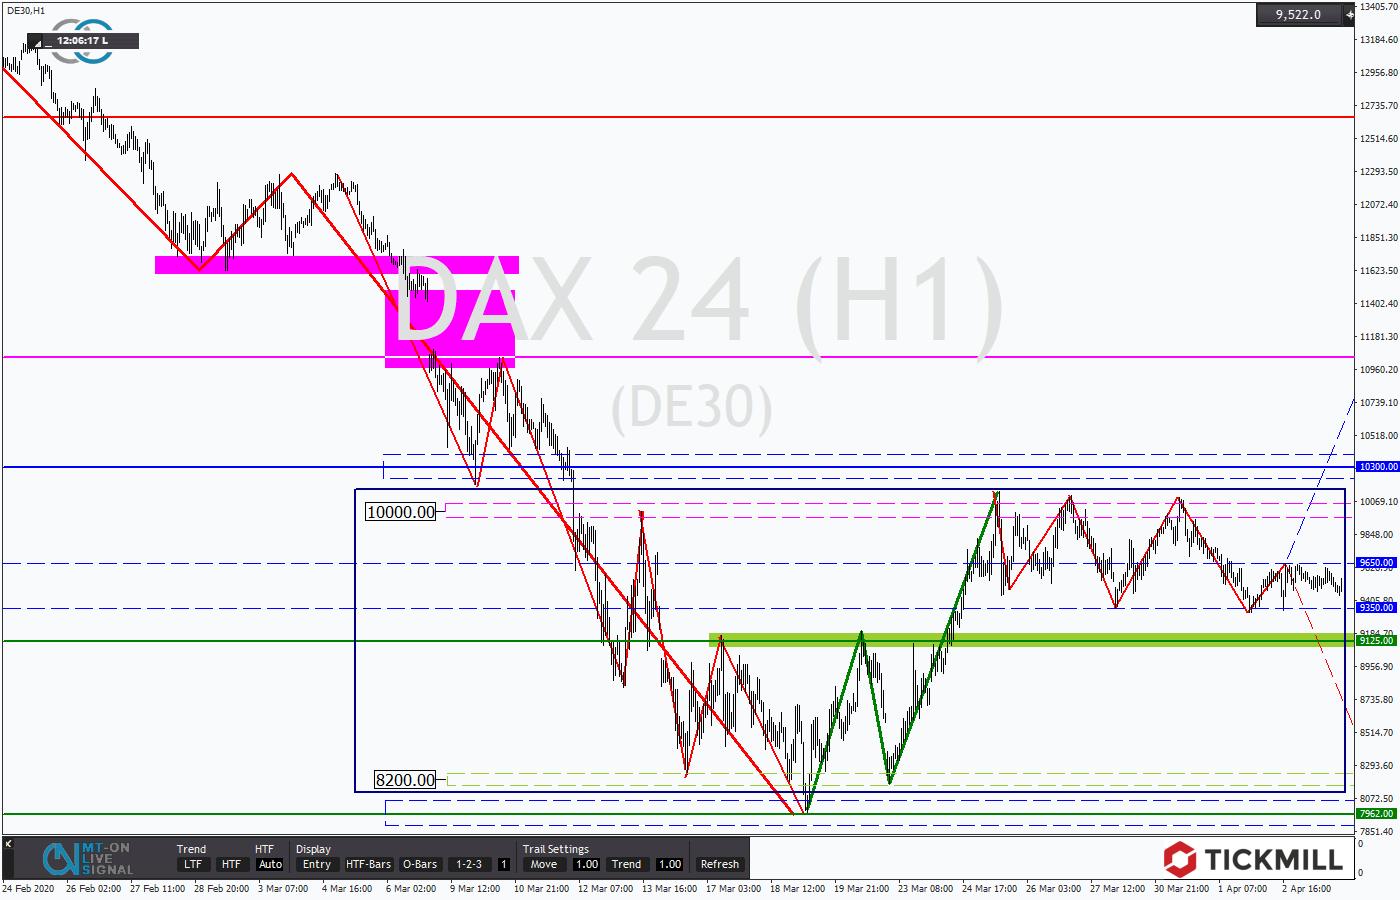 Tickmill-Analyse: DAX in Tradingbox